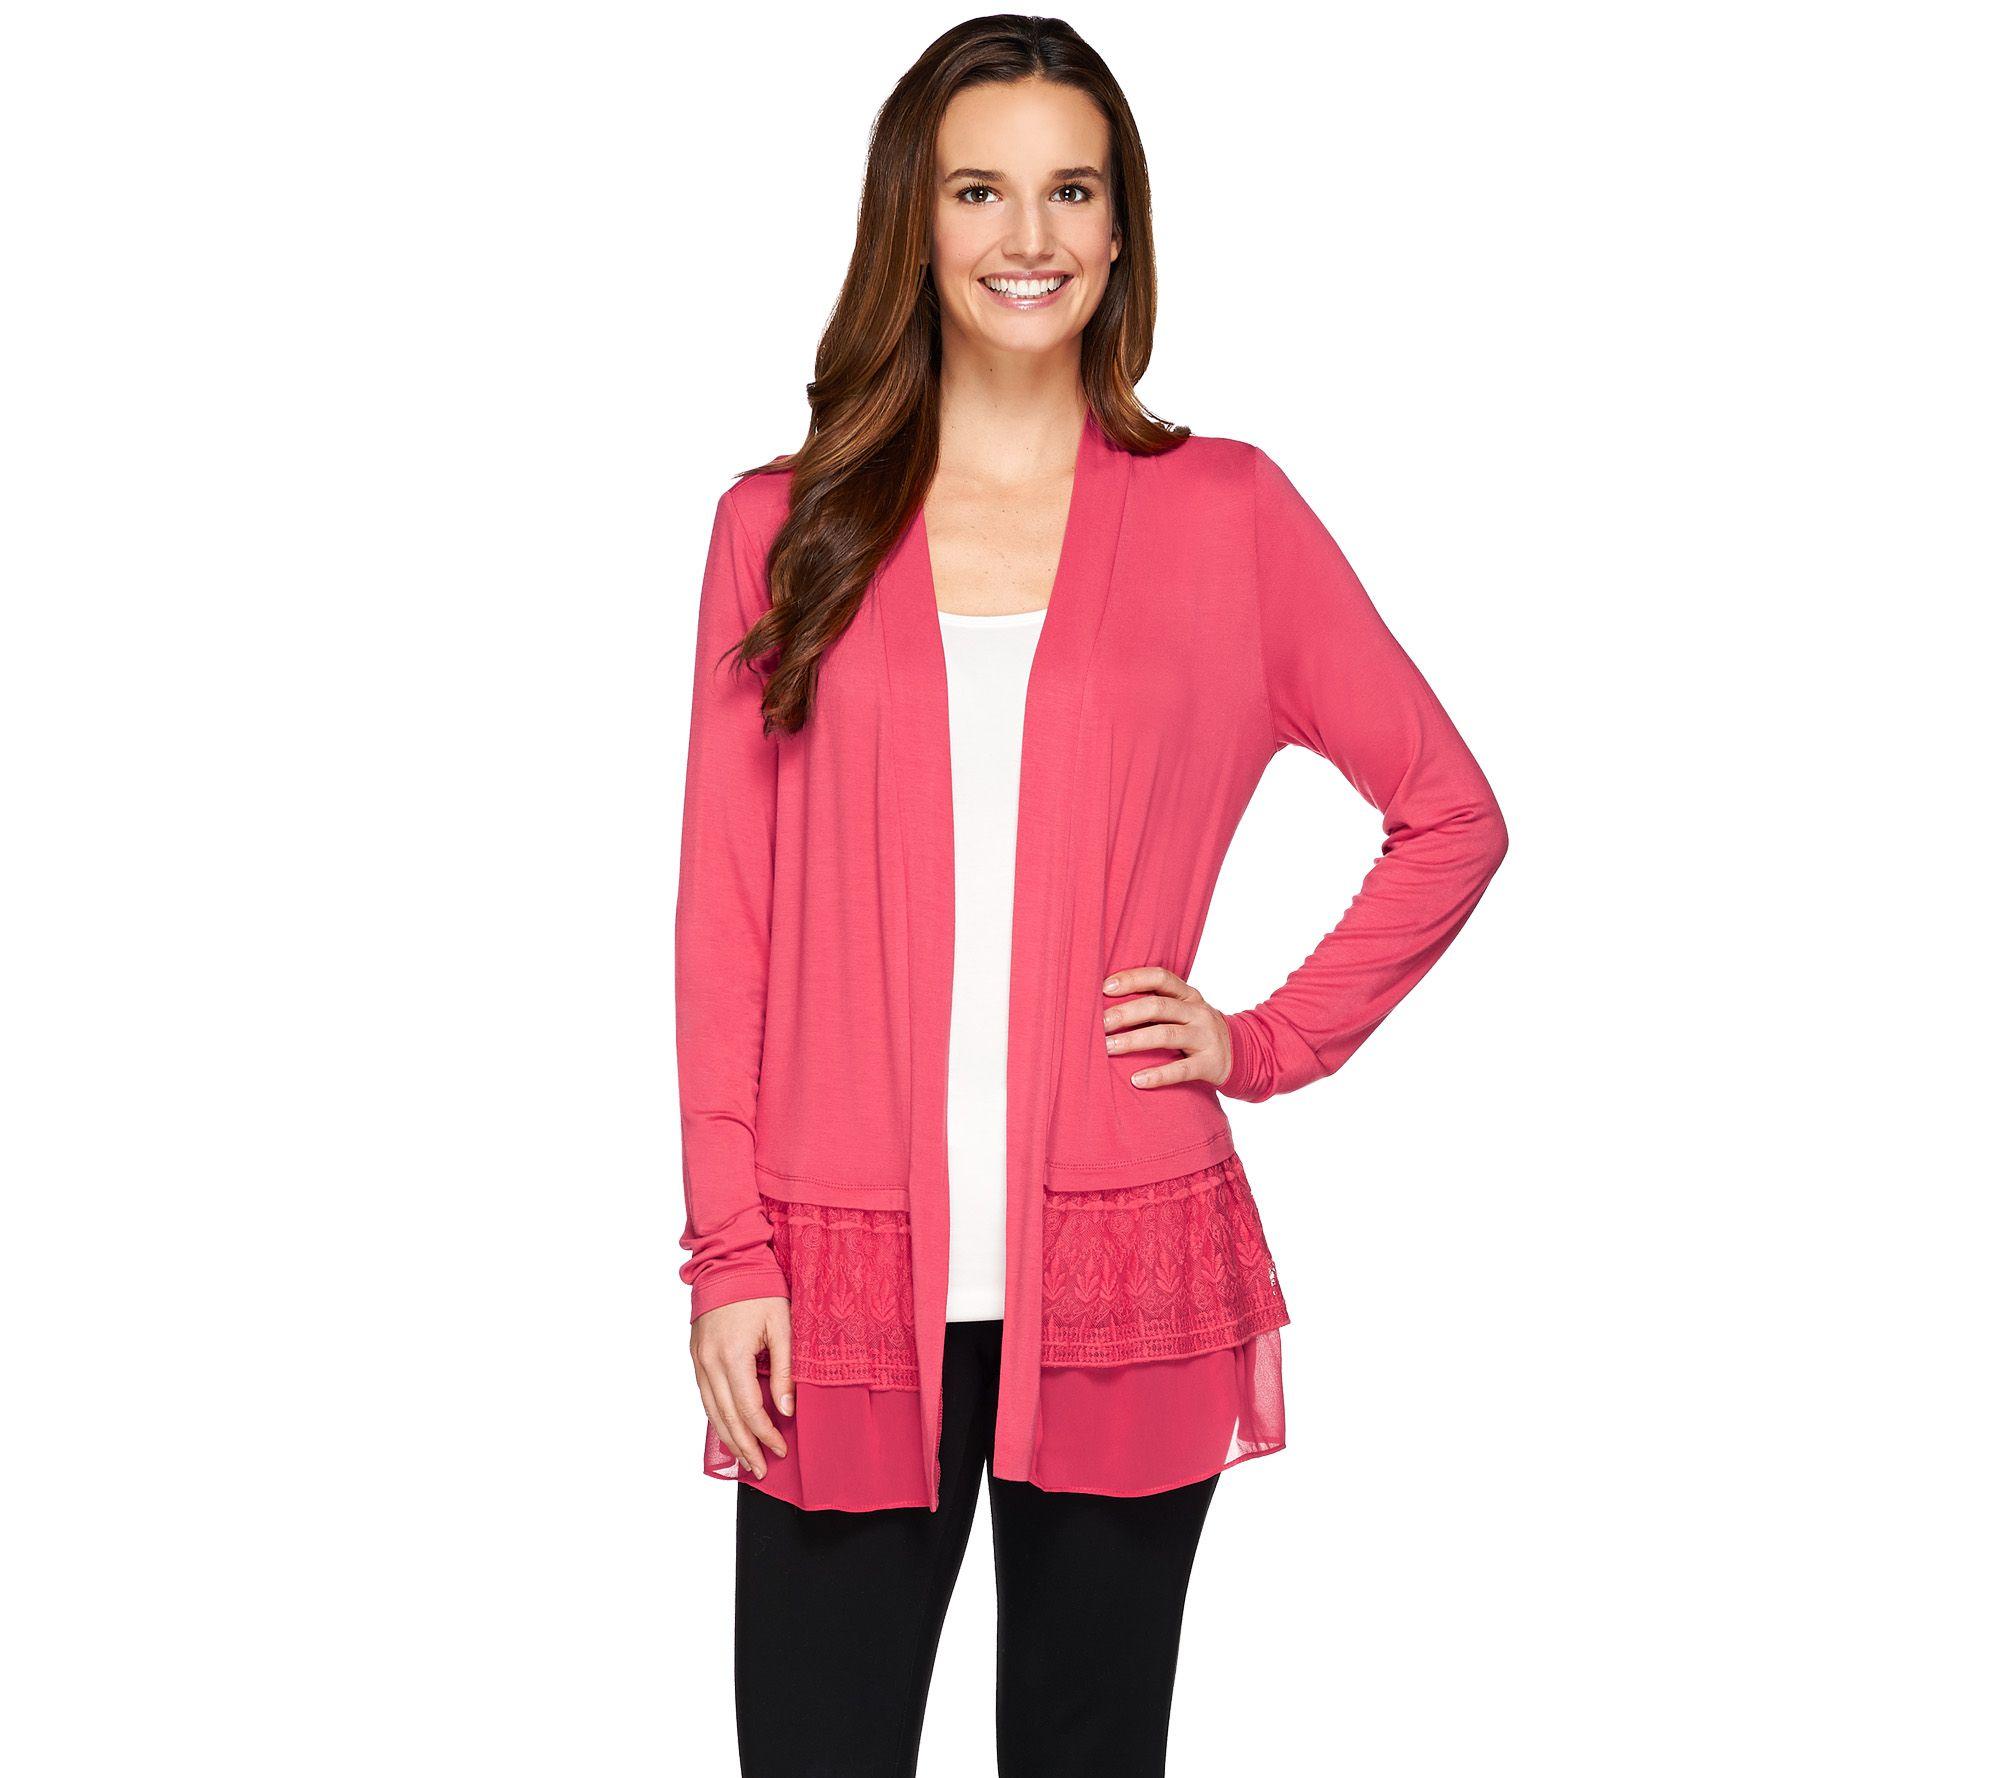 LOGO by Lori Goldstein — Sweaters & Cardigans — Fashion — QVC.com